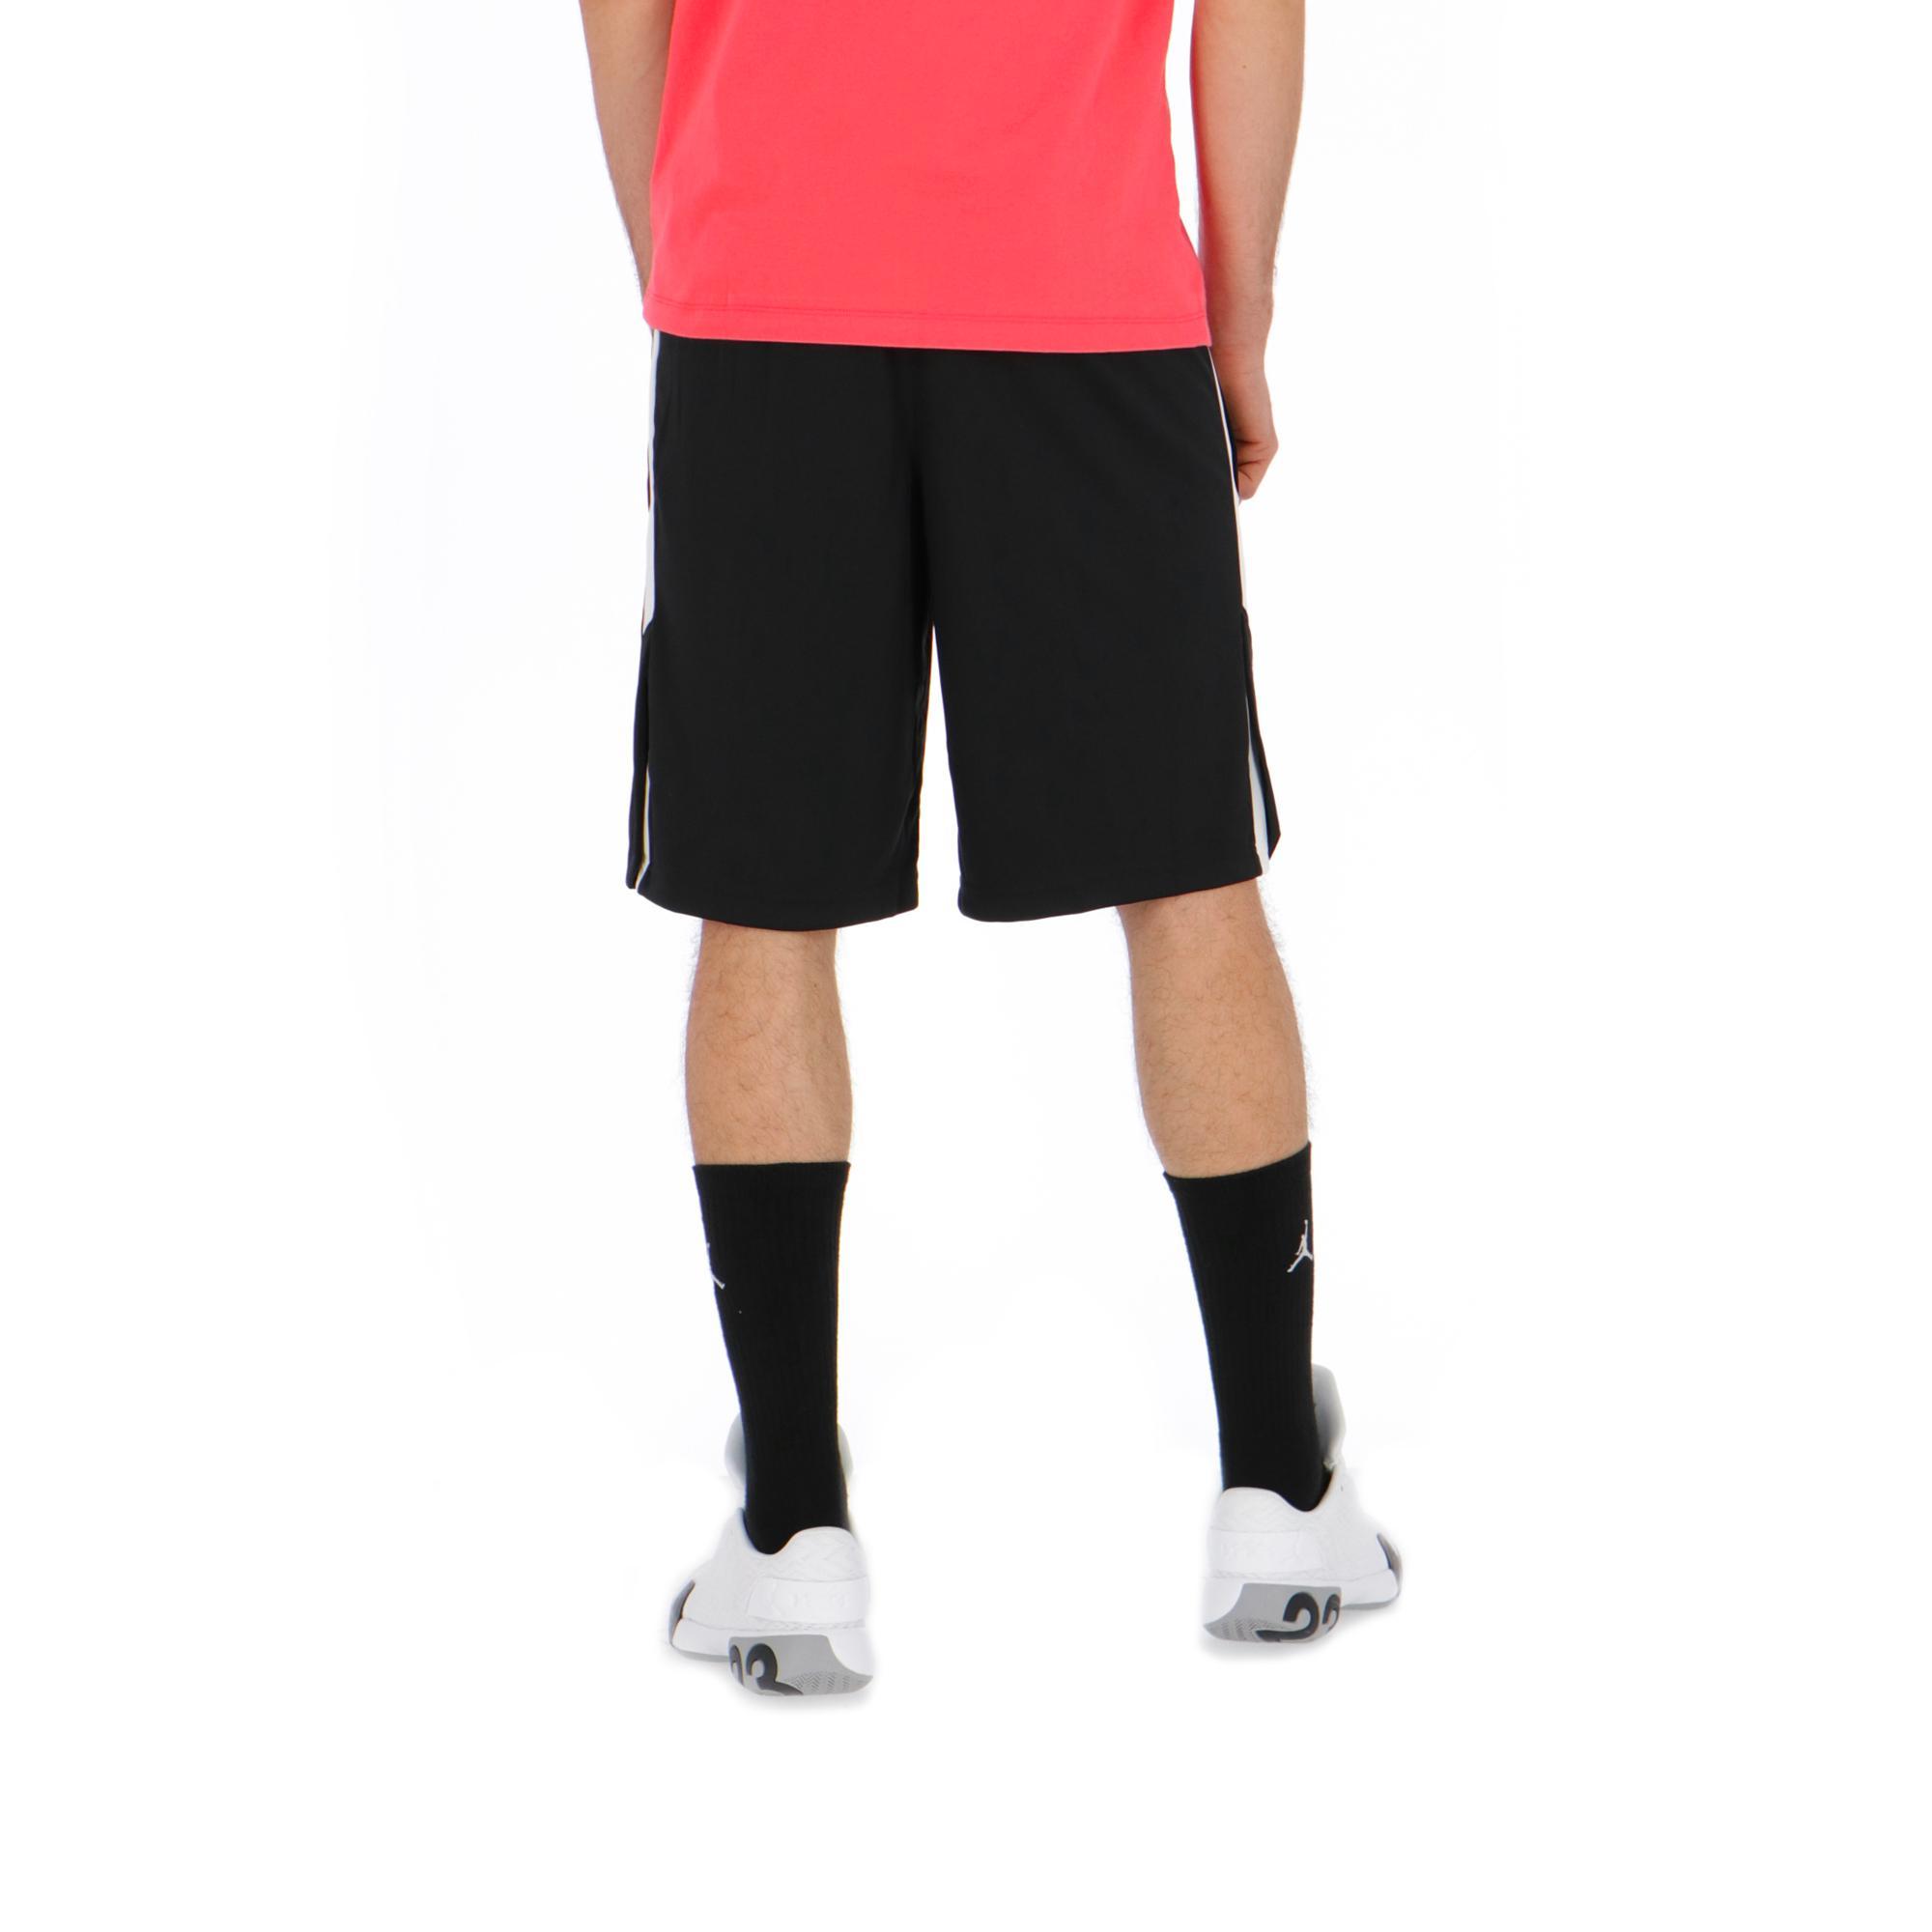 7145b1097fbb Jordan 23 Alpha Dry Knit Short br   Black White